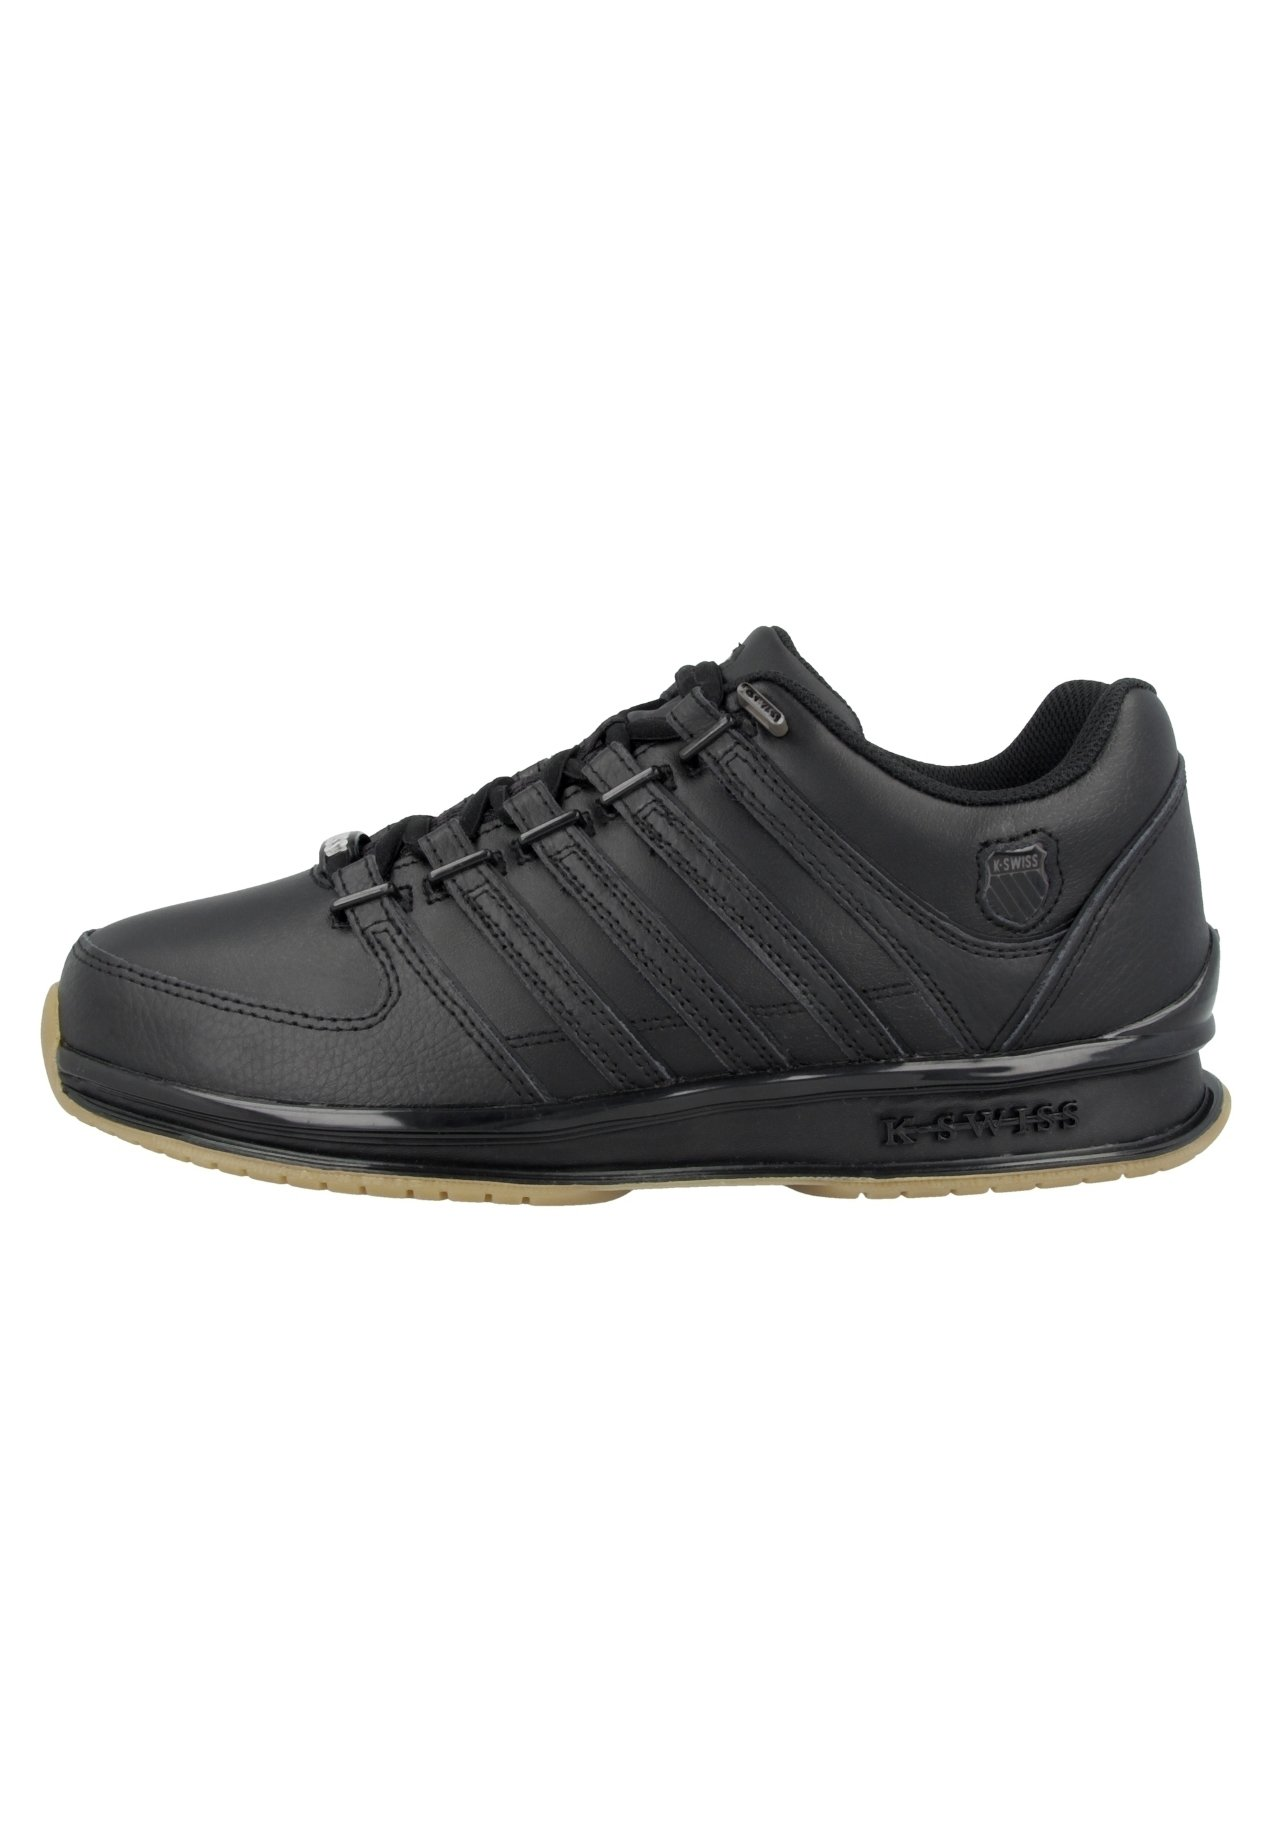 Homme RINZLER - Baskets basses - black gum